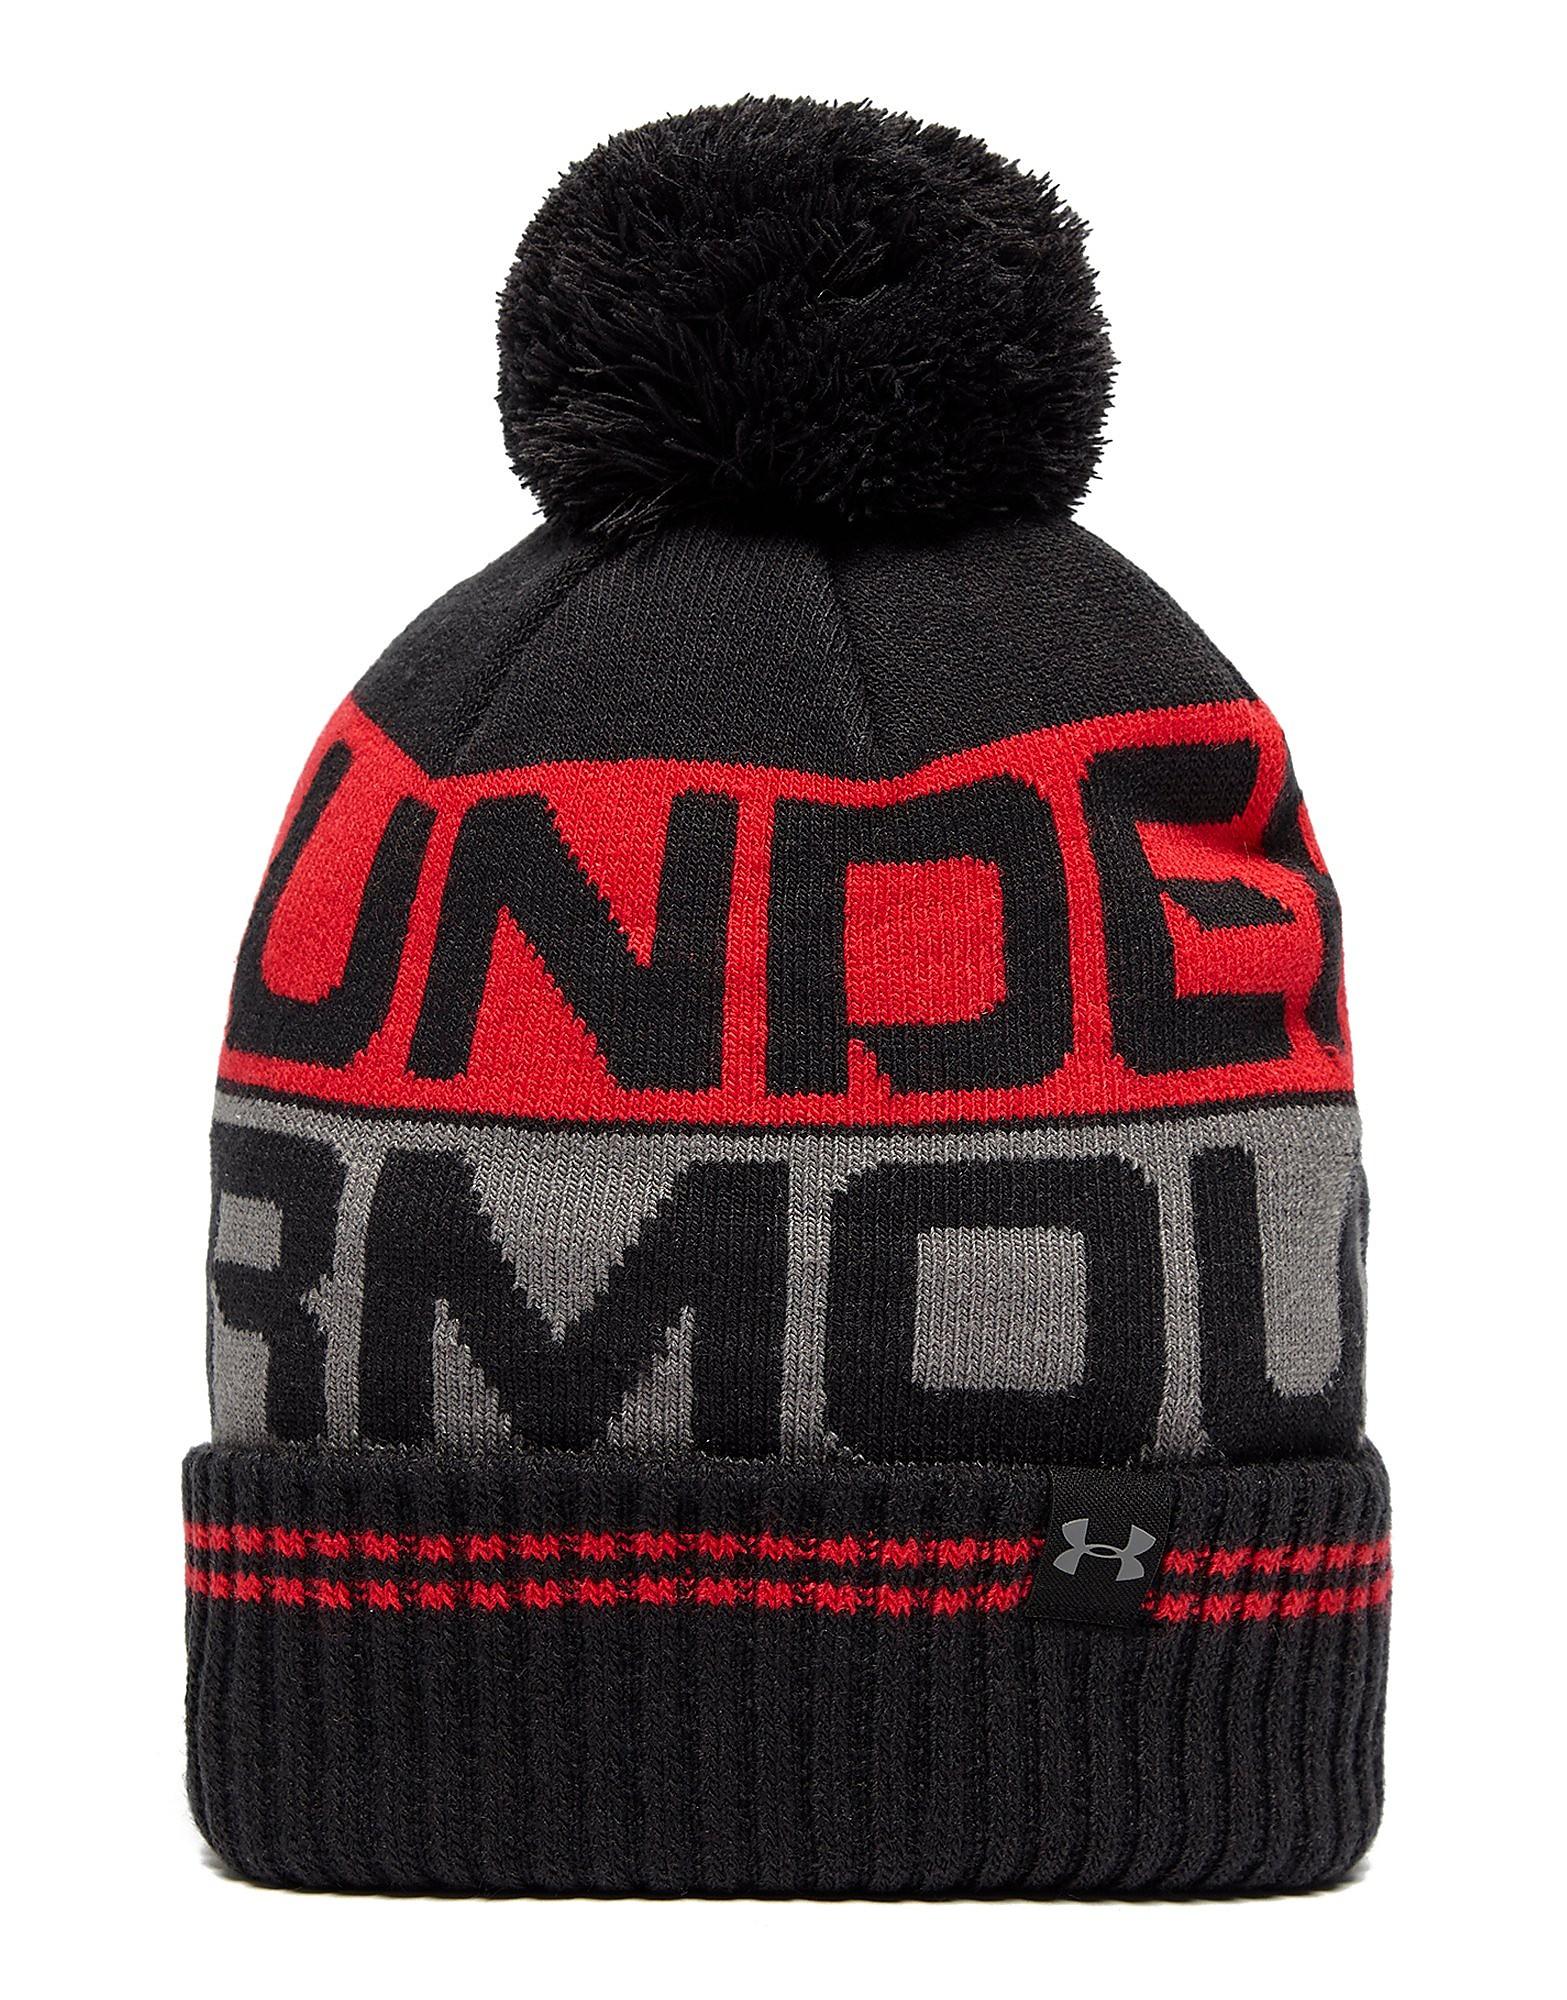 Under Armour Retro Pom 2.0 Beanie Hat